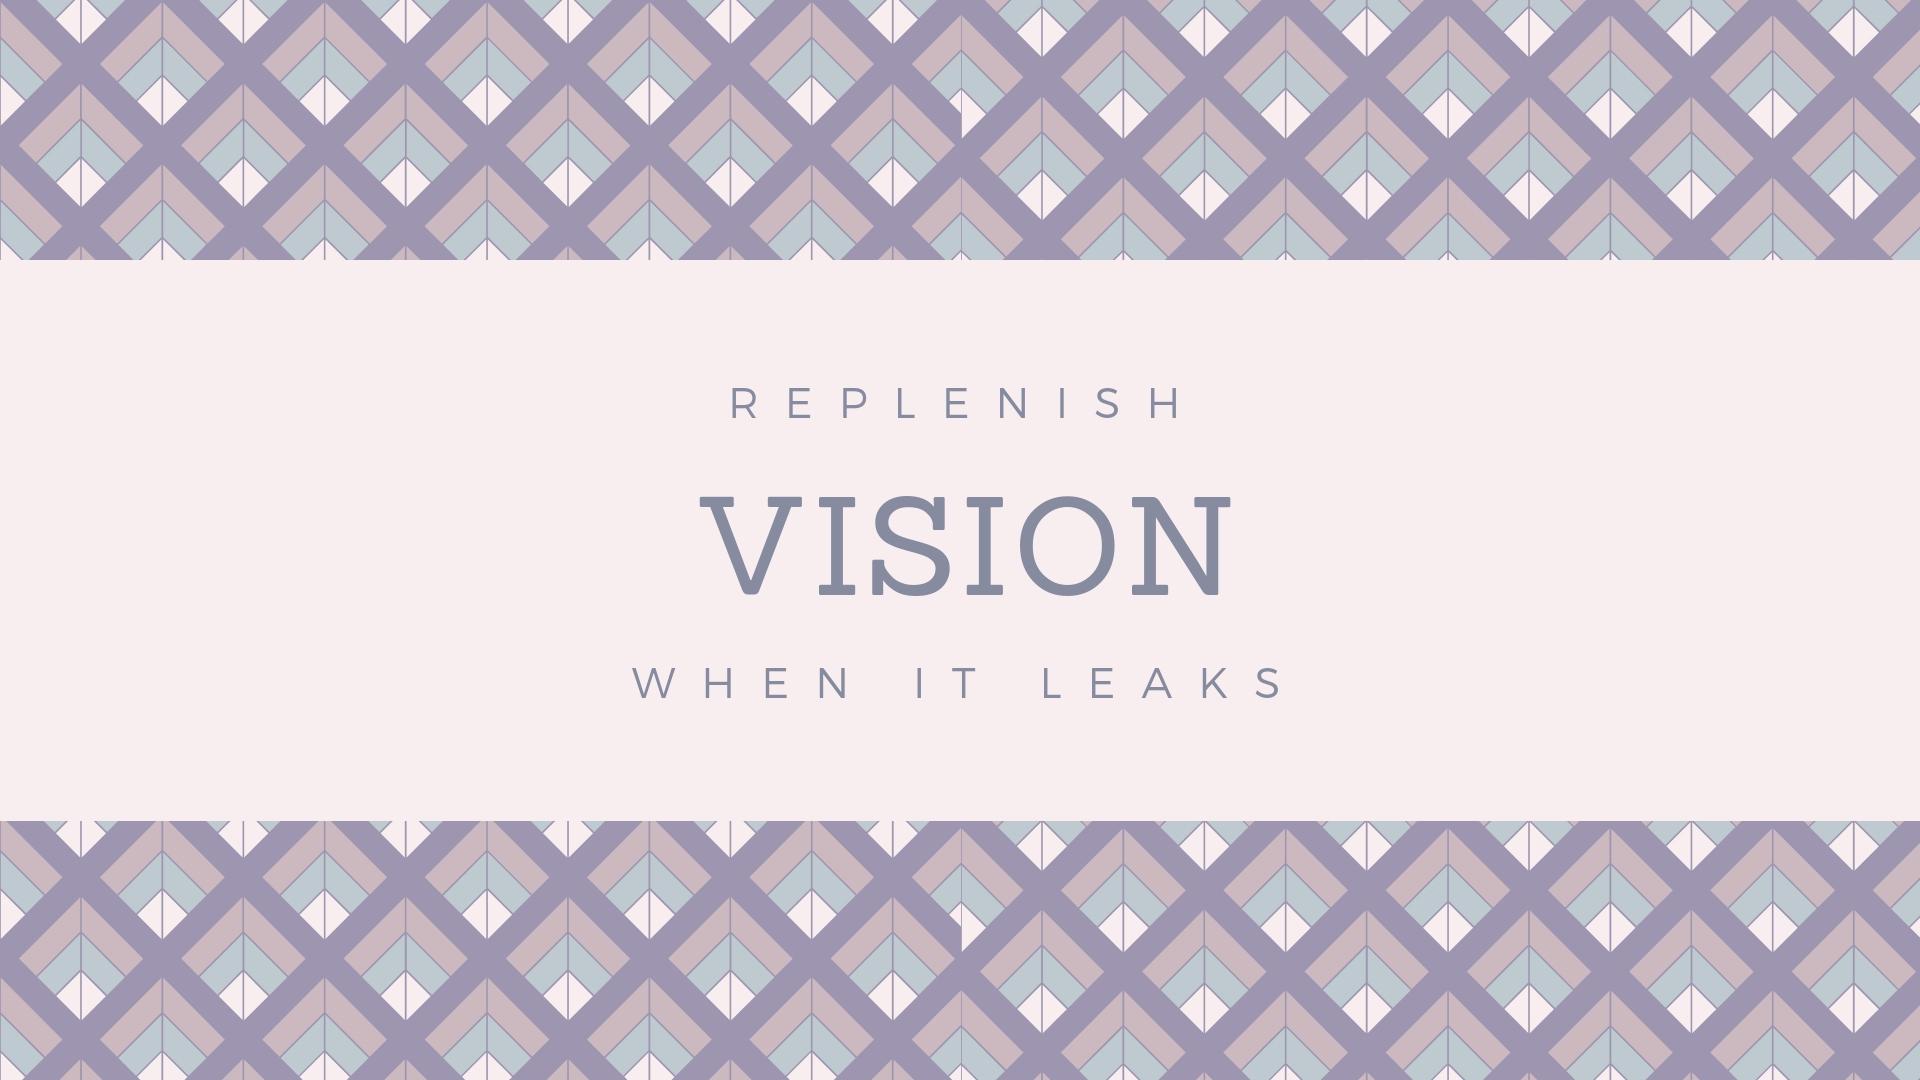 replenish vision